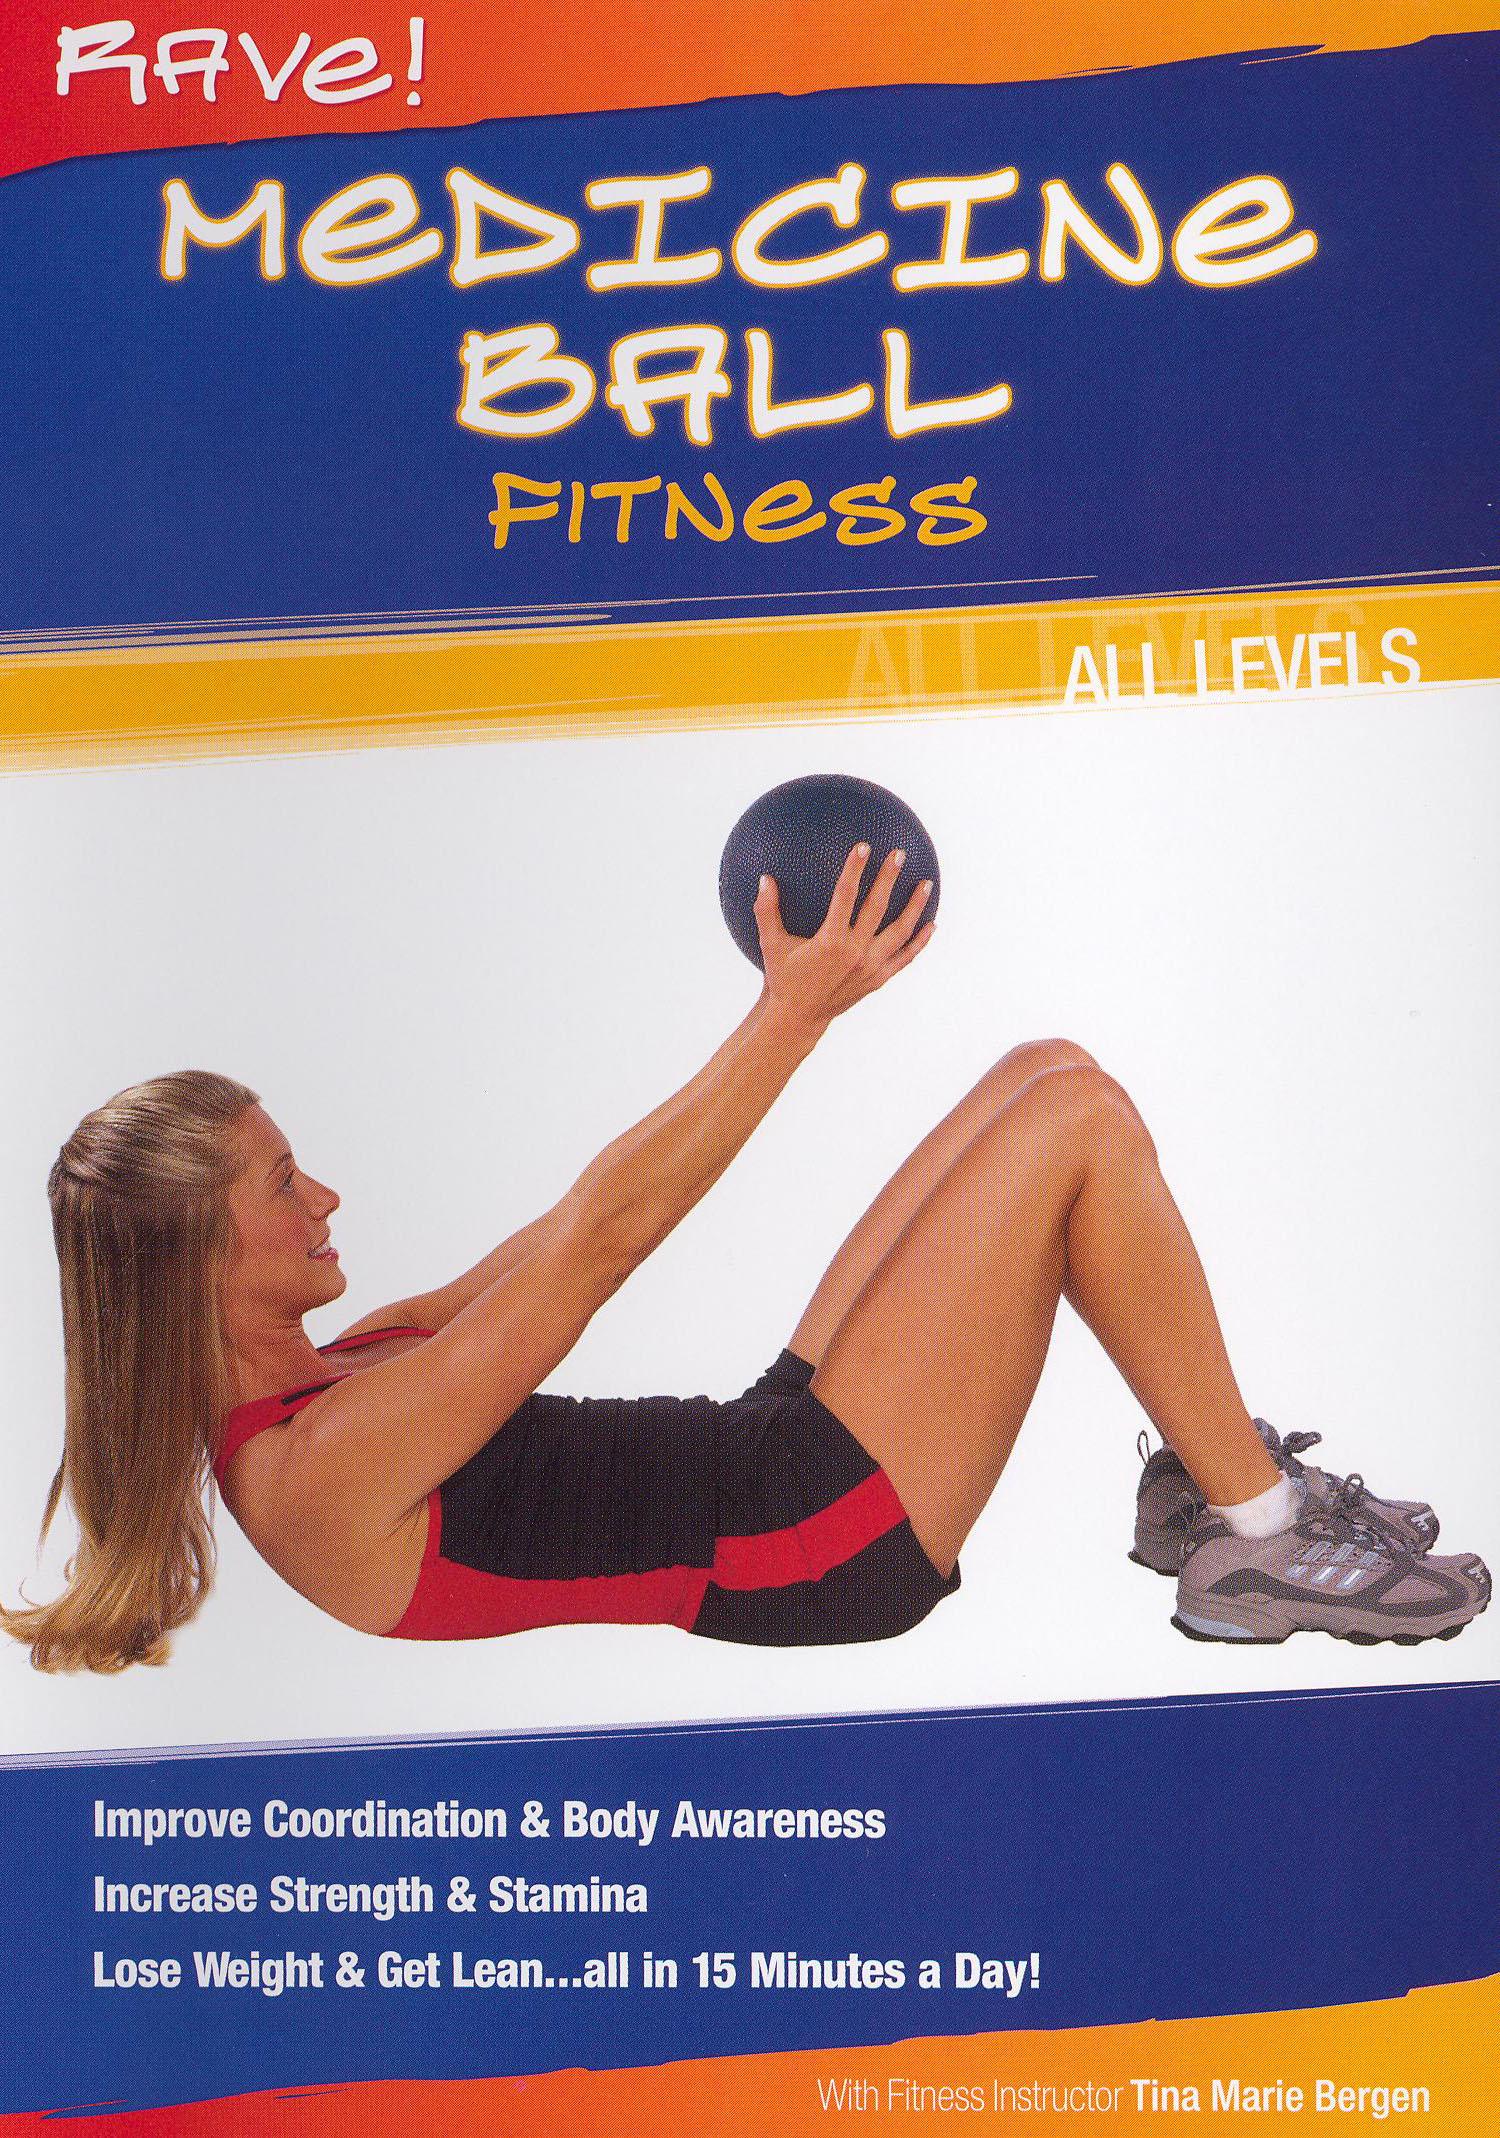 Rave! Medicine Ball Fitness